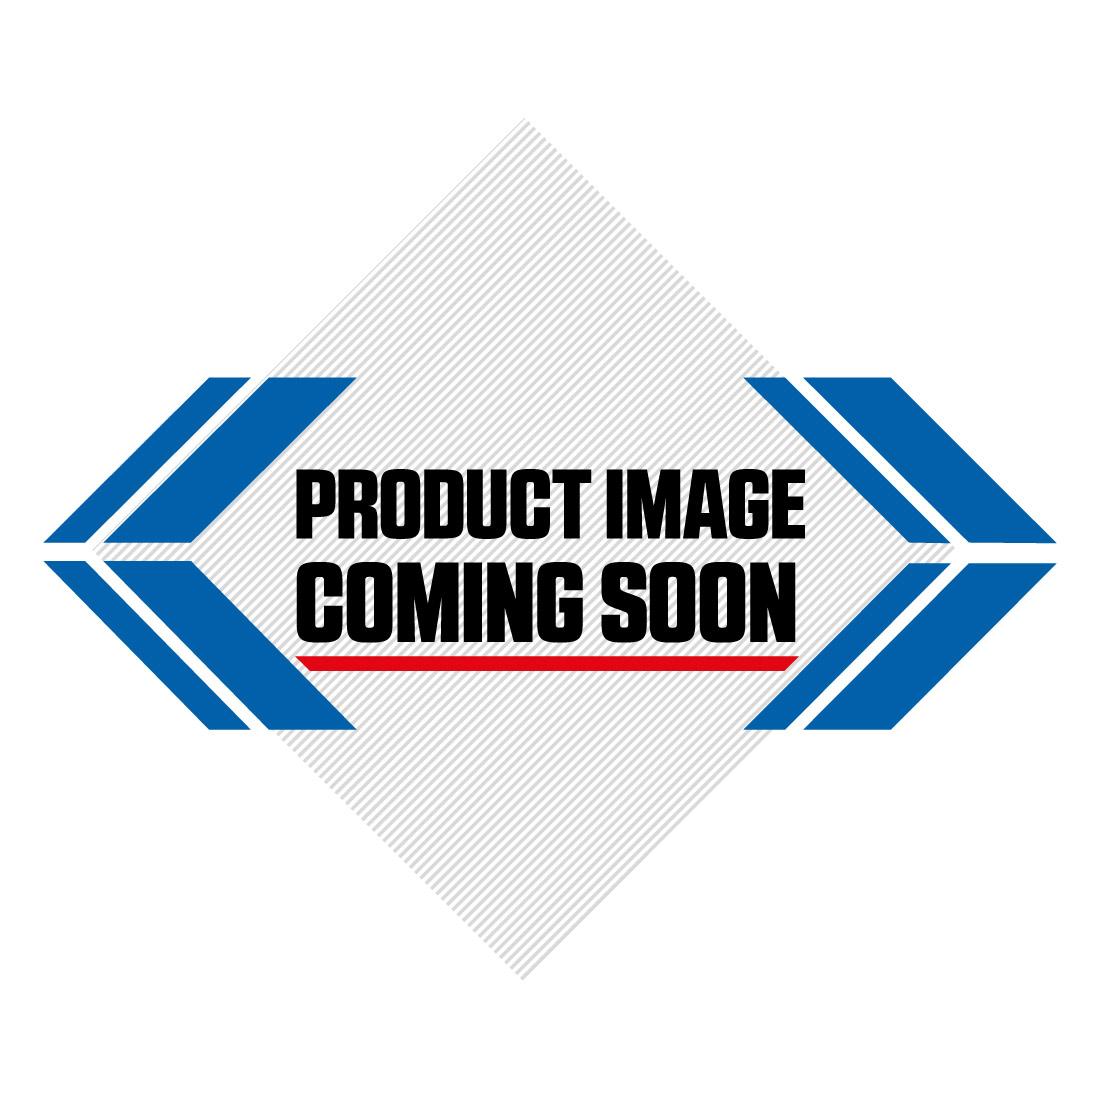 Suzuki Plastic Kit  RM 125 250 (99-00) Black Image-2>